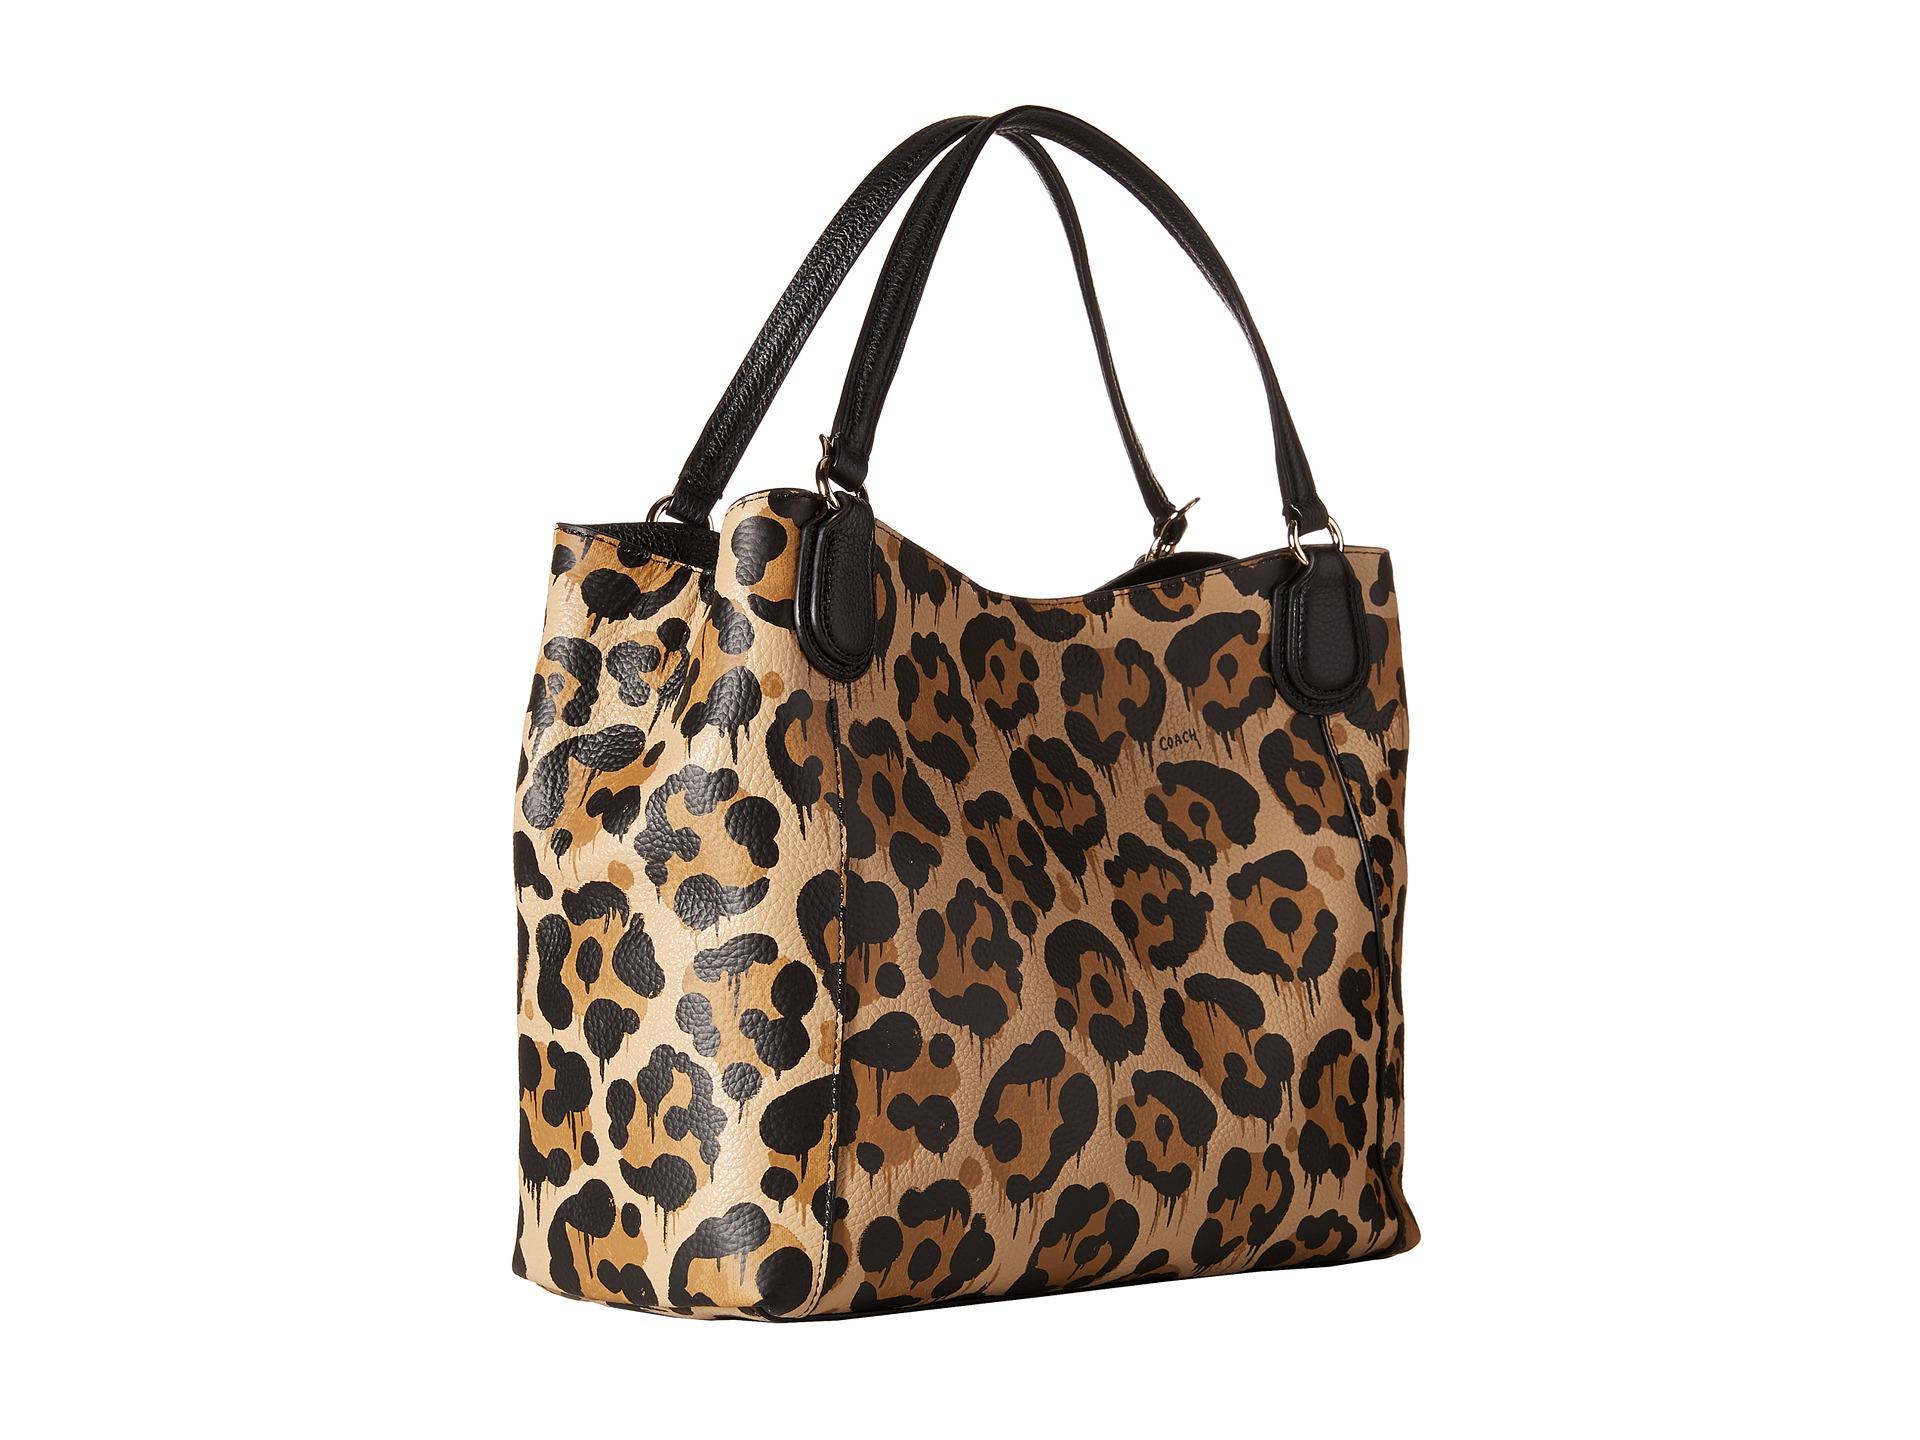 2b5a6419be10 Coach Leopard Ocelot Print E 28 In Brown Lyst. Information. Alpine Coach  Leopard Tote Bag Outlet F31901 B4 M2 Black